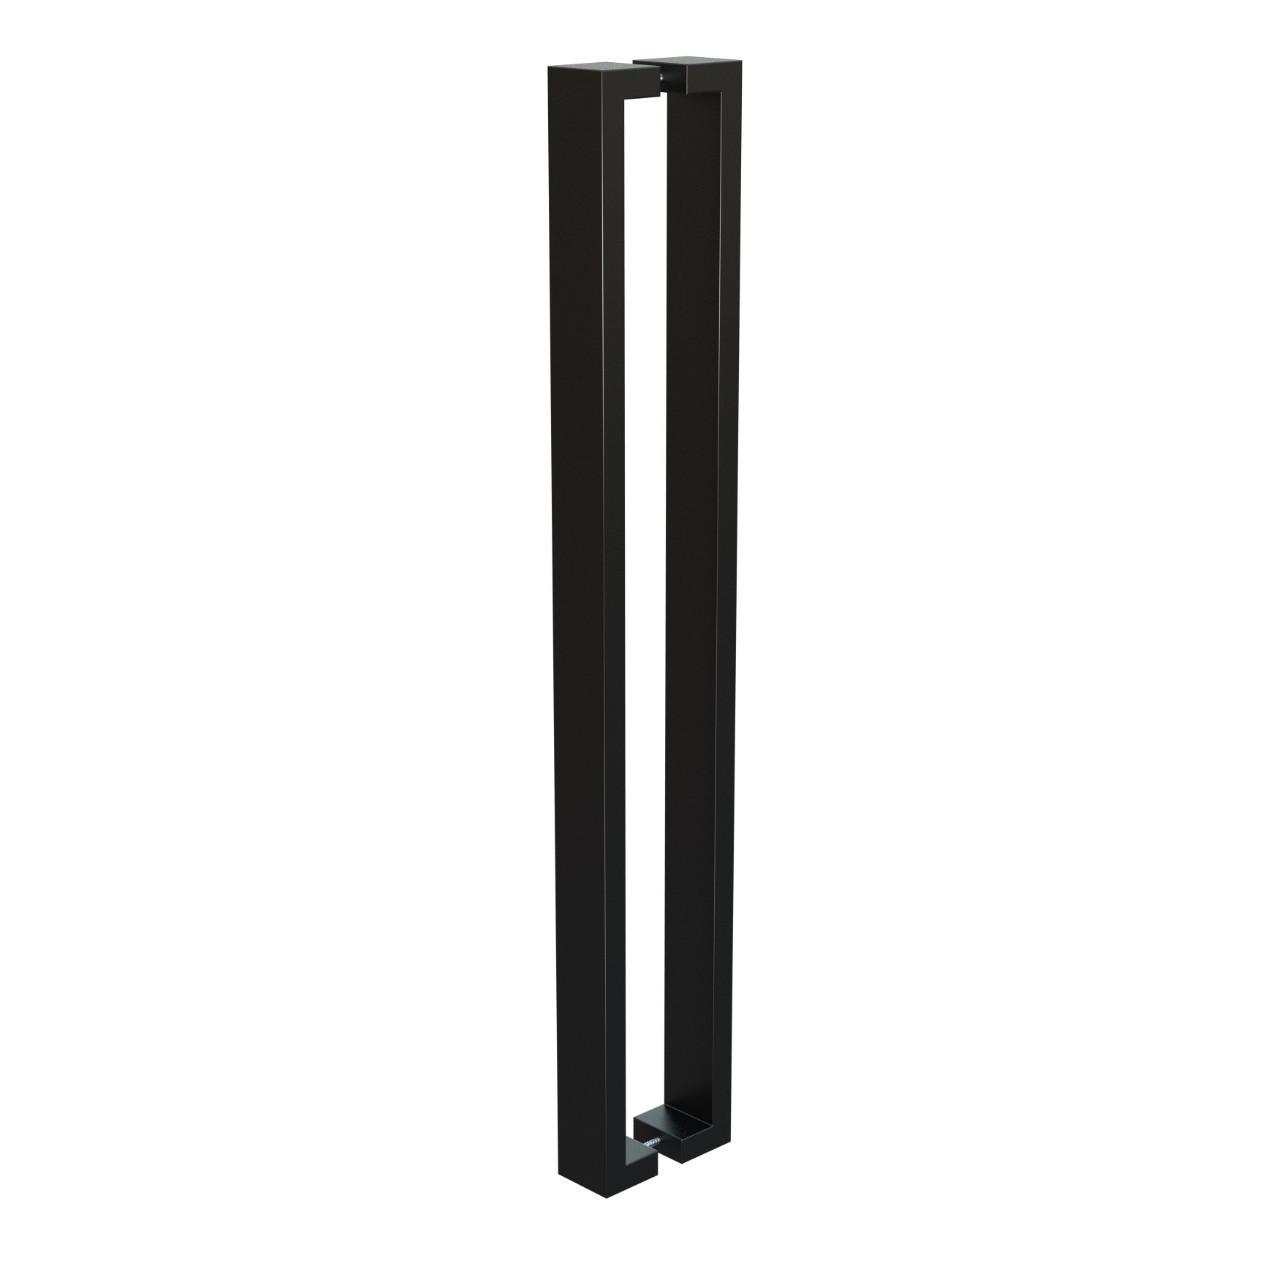 Puxador de Portas Sobrepor Aco Inox 101cm 1 par Leblon - Acobrasil